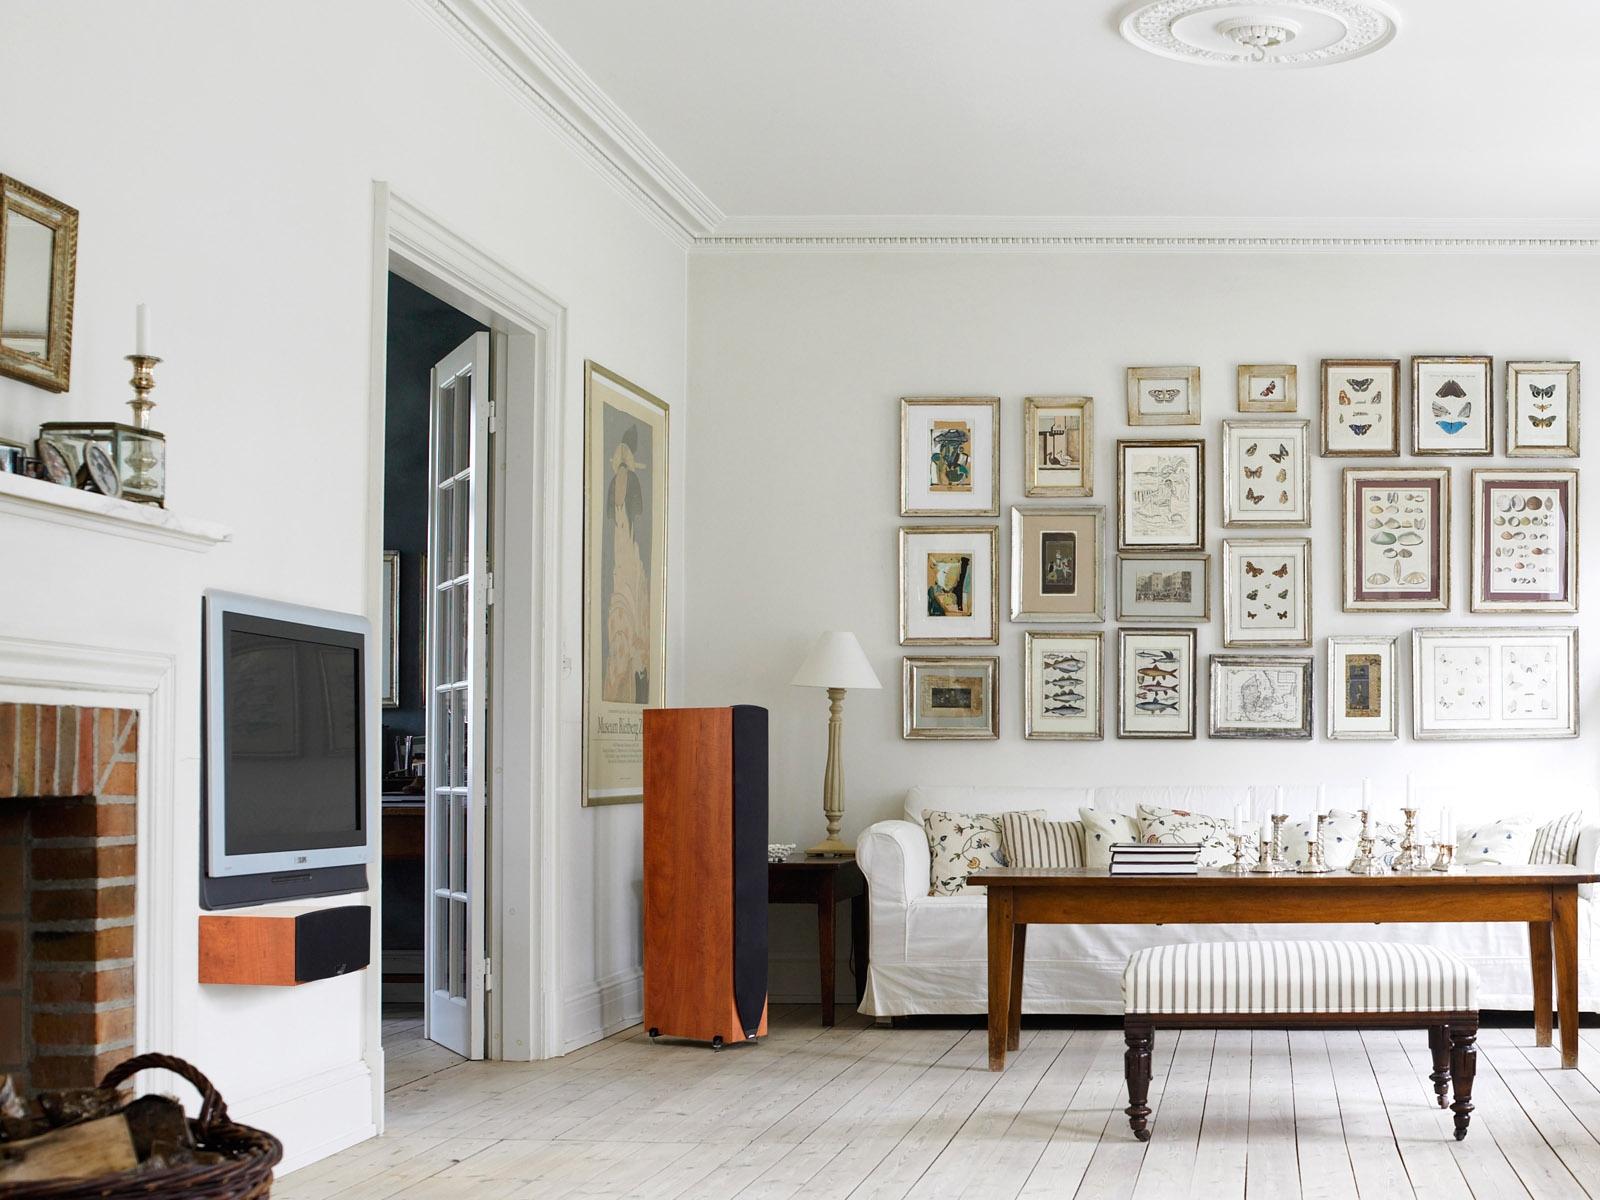 Fondos de pantalla dibujo habitaci n pared dise o de interiores inmuebles piso paredes - Diseno de interiores paredes ...